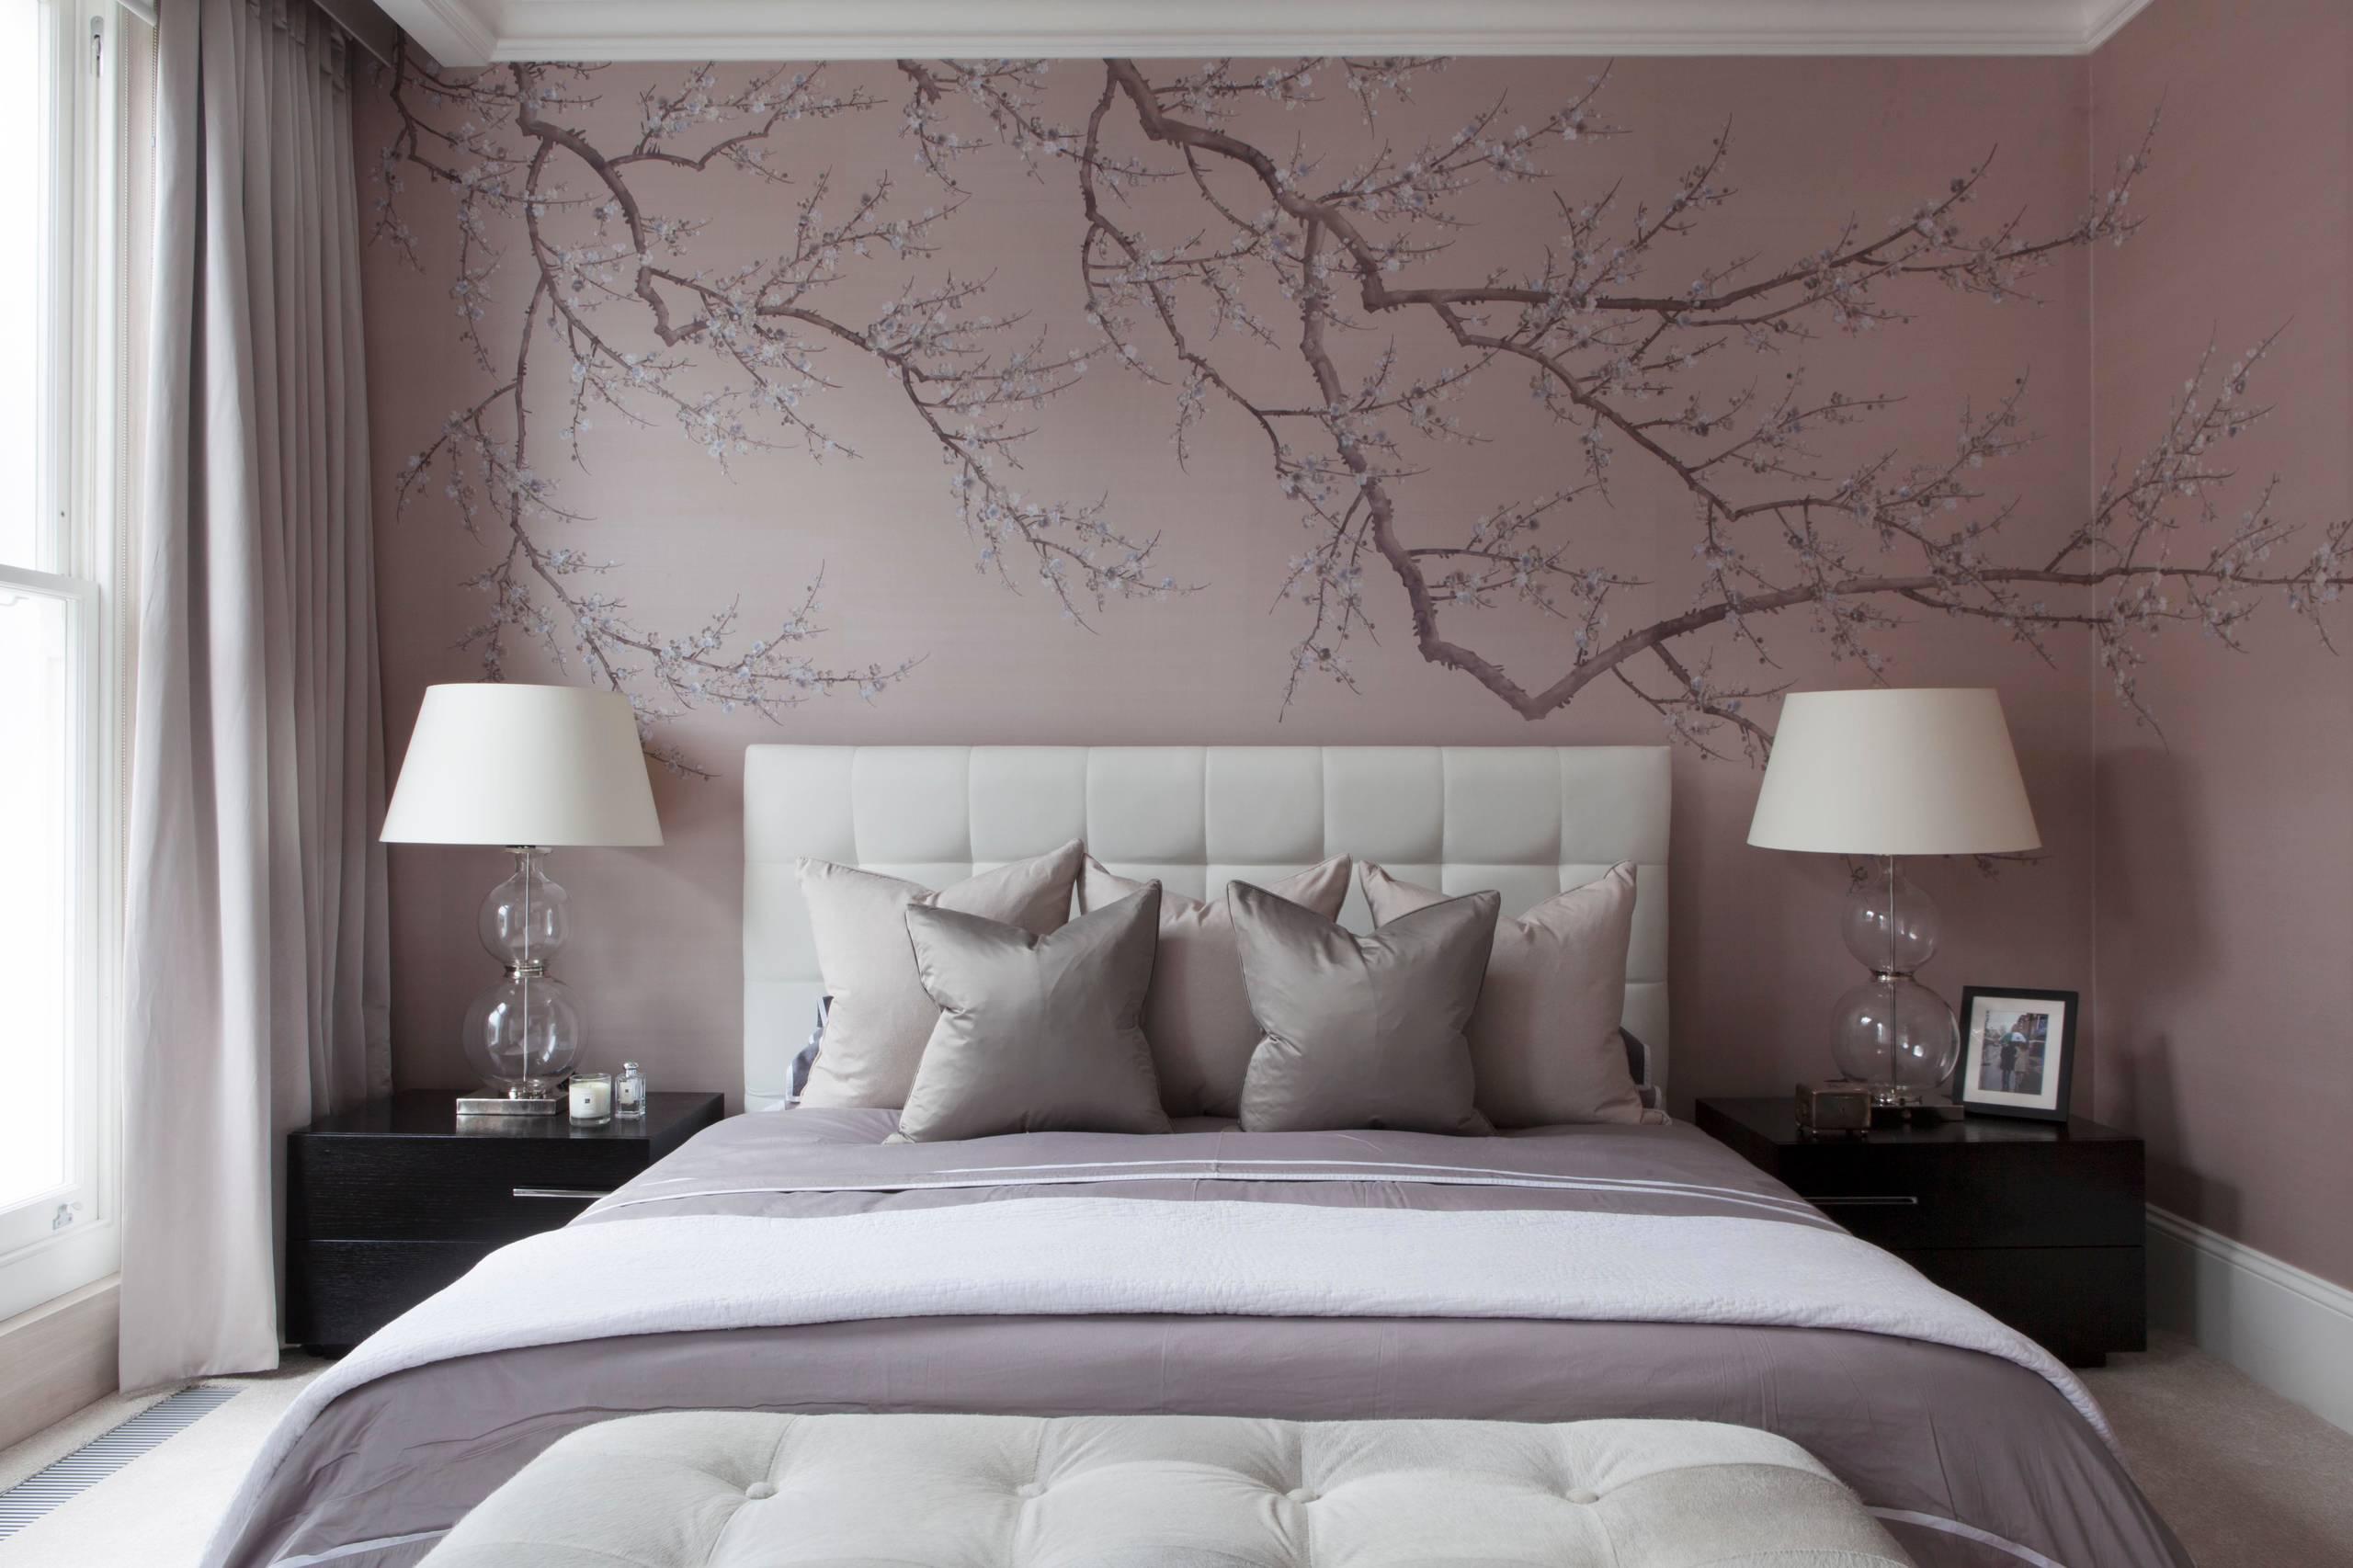 Cherry Blossom Bedroom Ideas And Photos Houzz